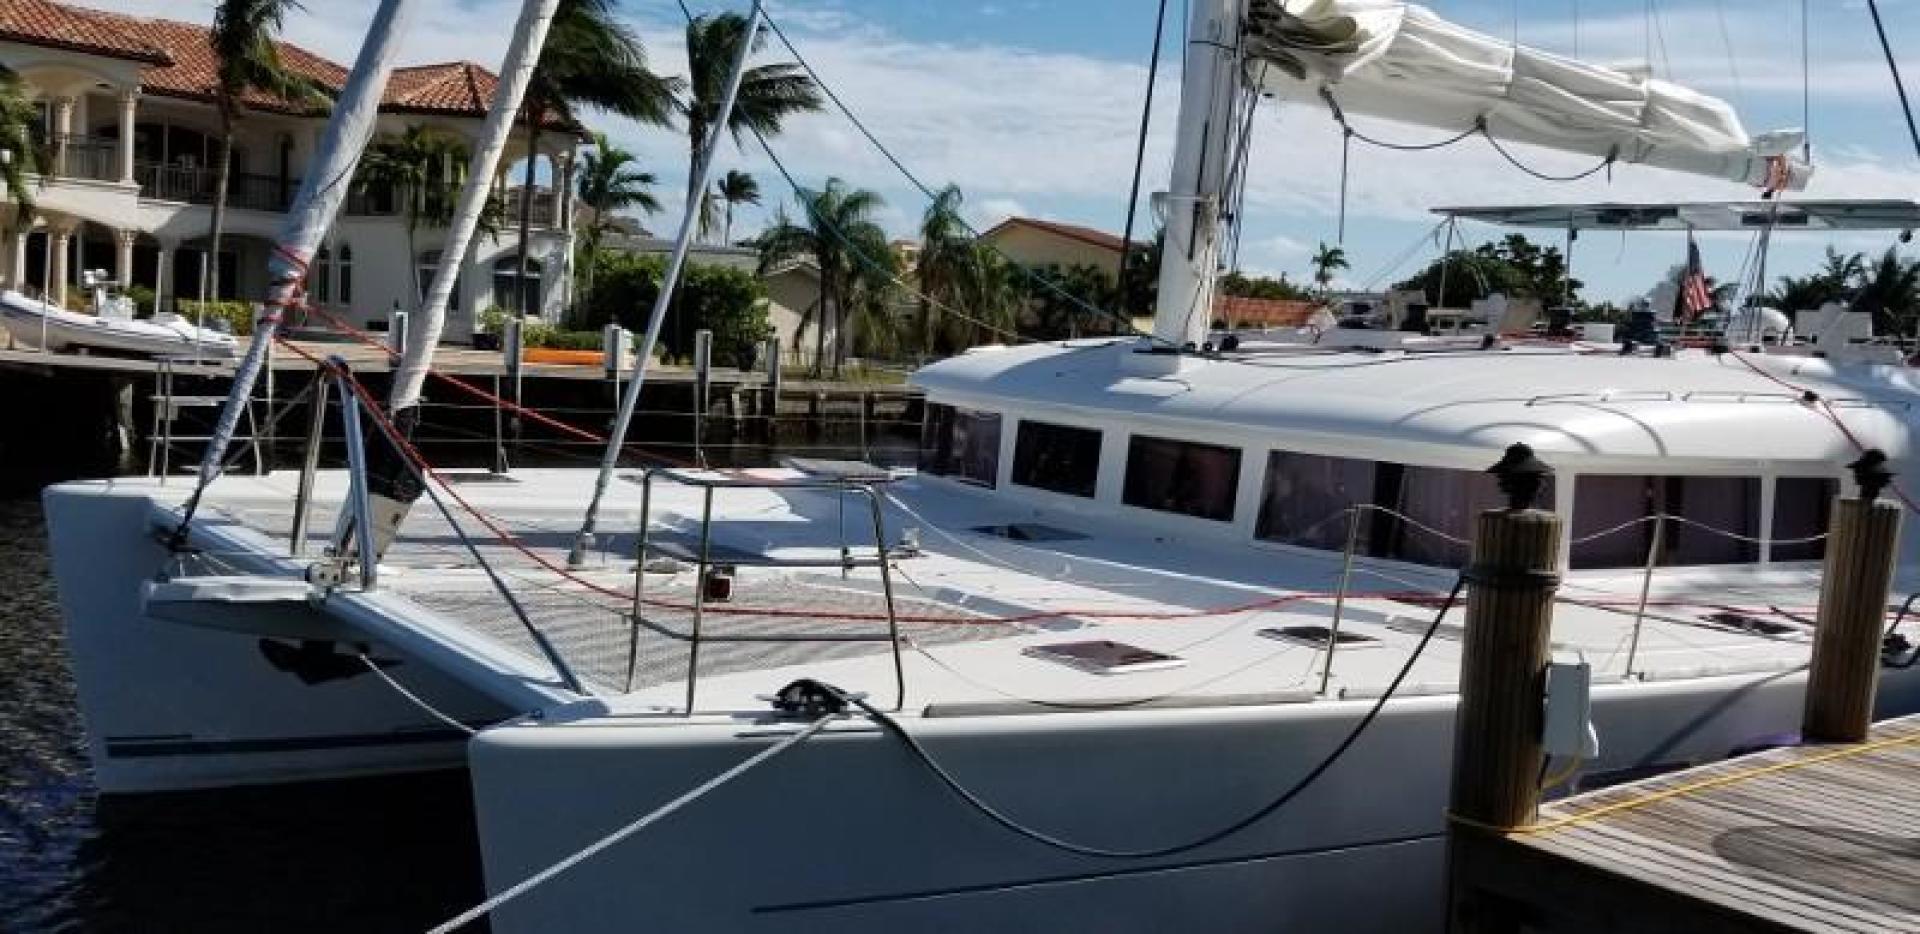 Lagoon-620 2011-Princess Hera Fort Lauderdale-Florida-United States-303758 | Thumbnail